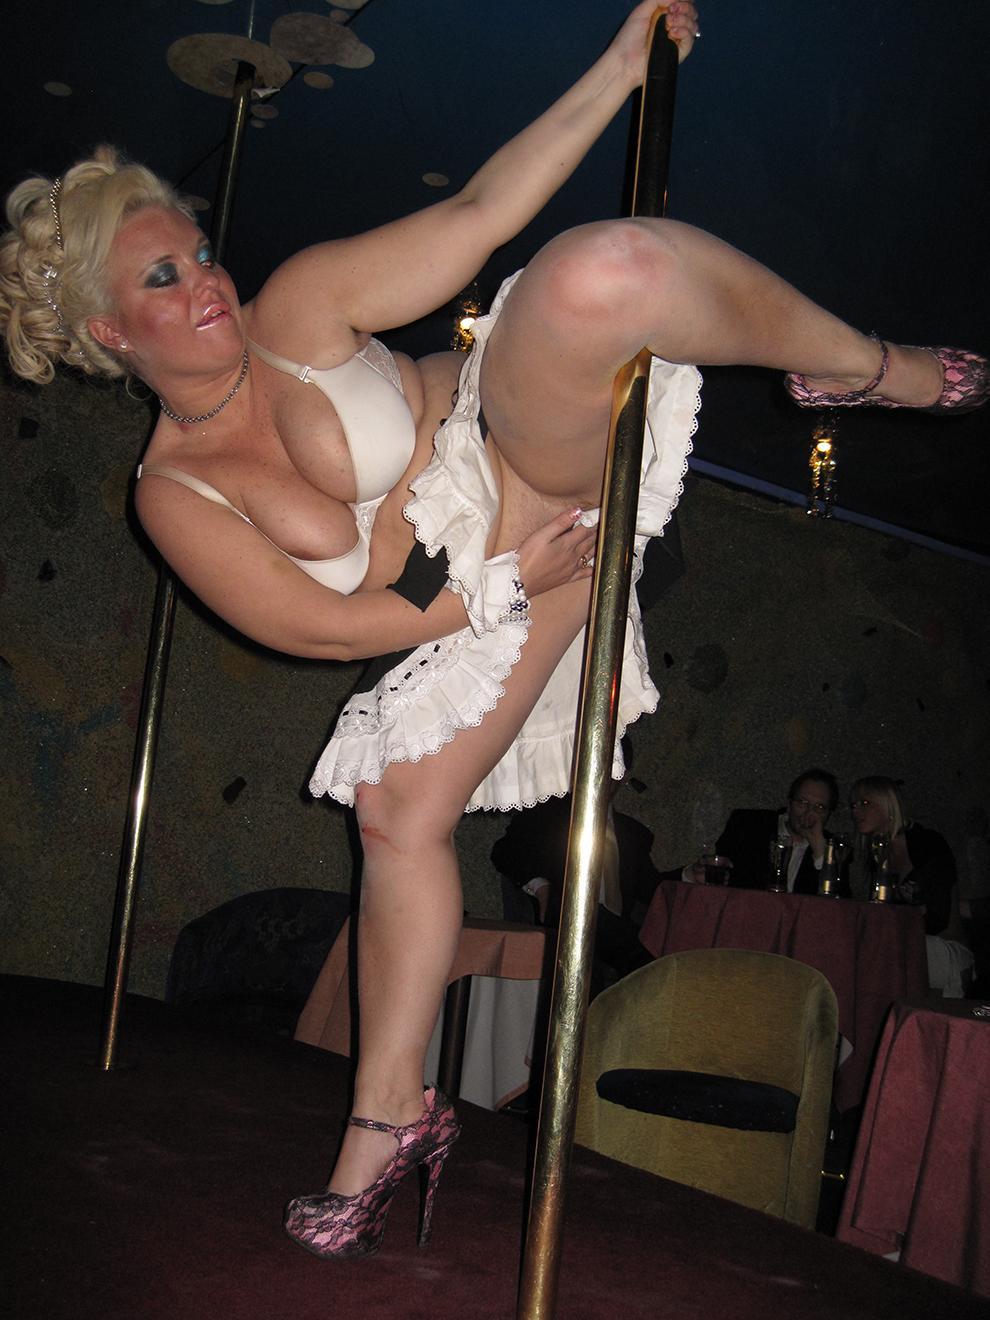 kirsi ståhlberg tissit porno foto